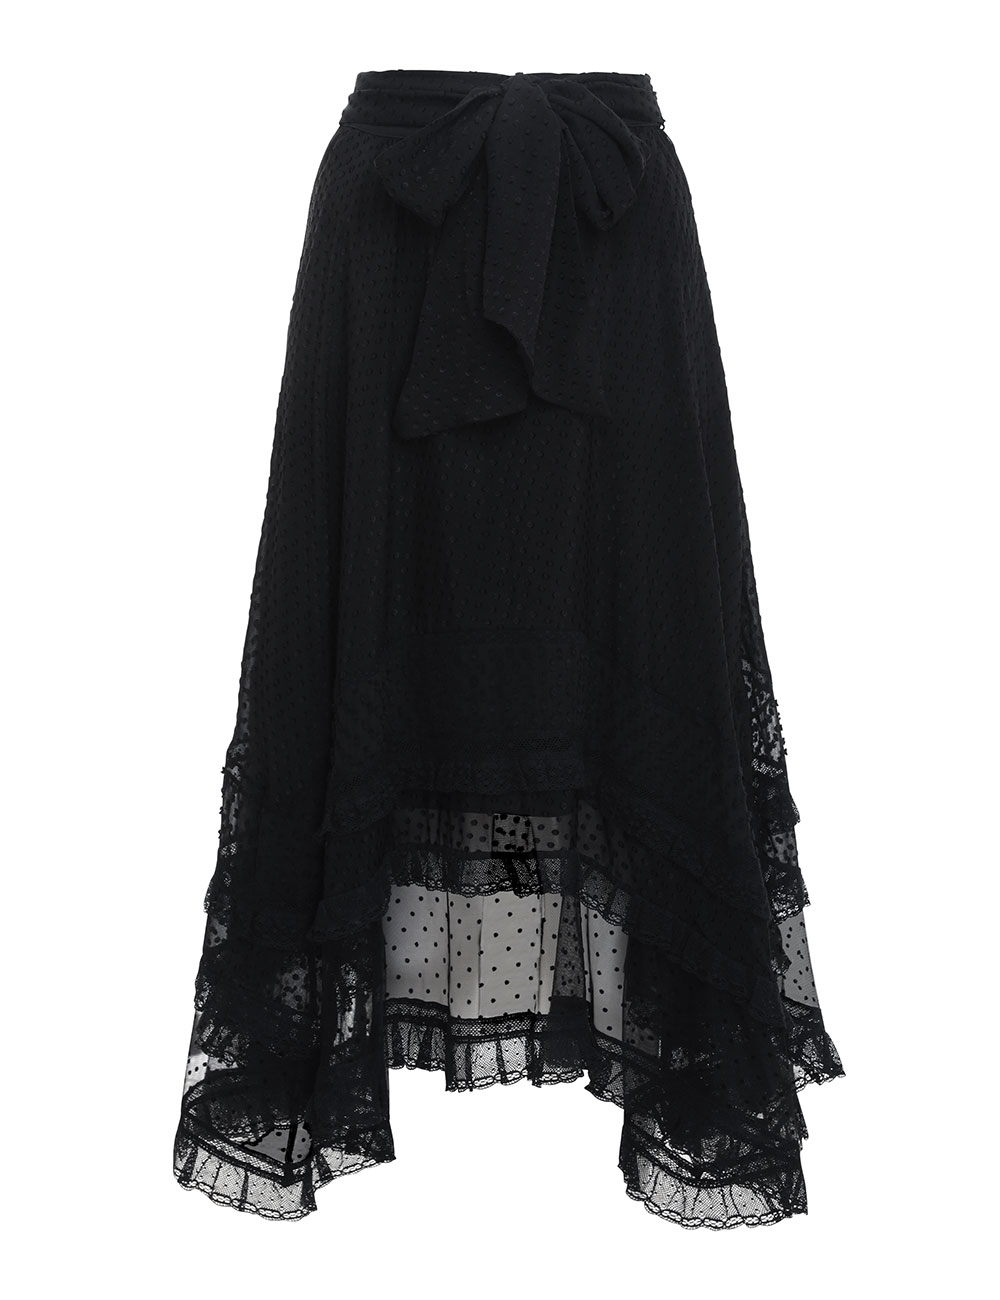 Brightside Textured Skirt